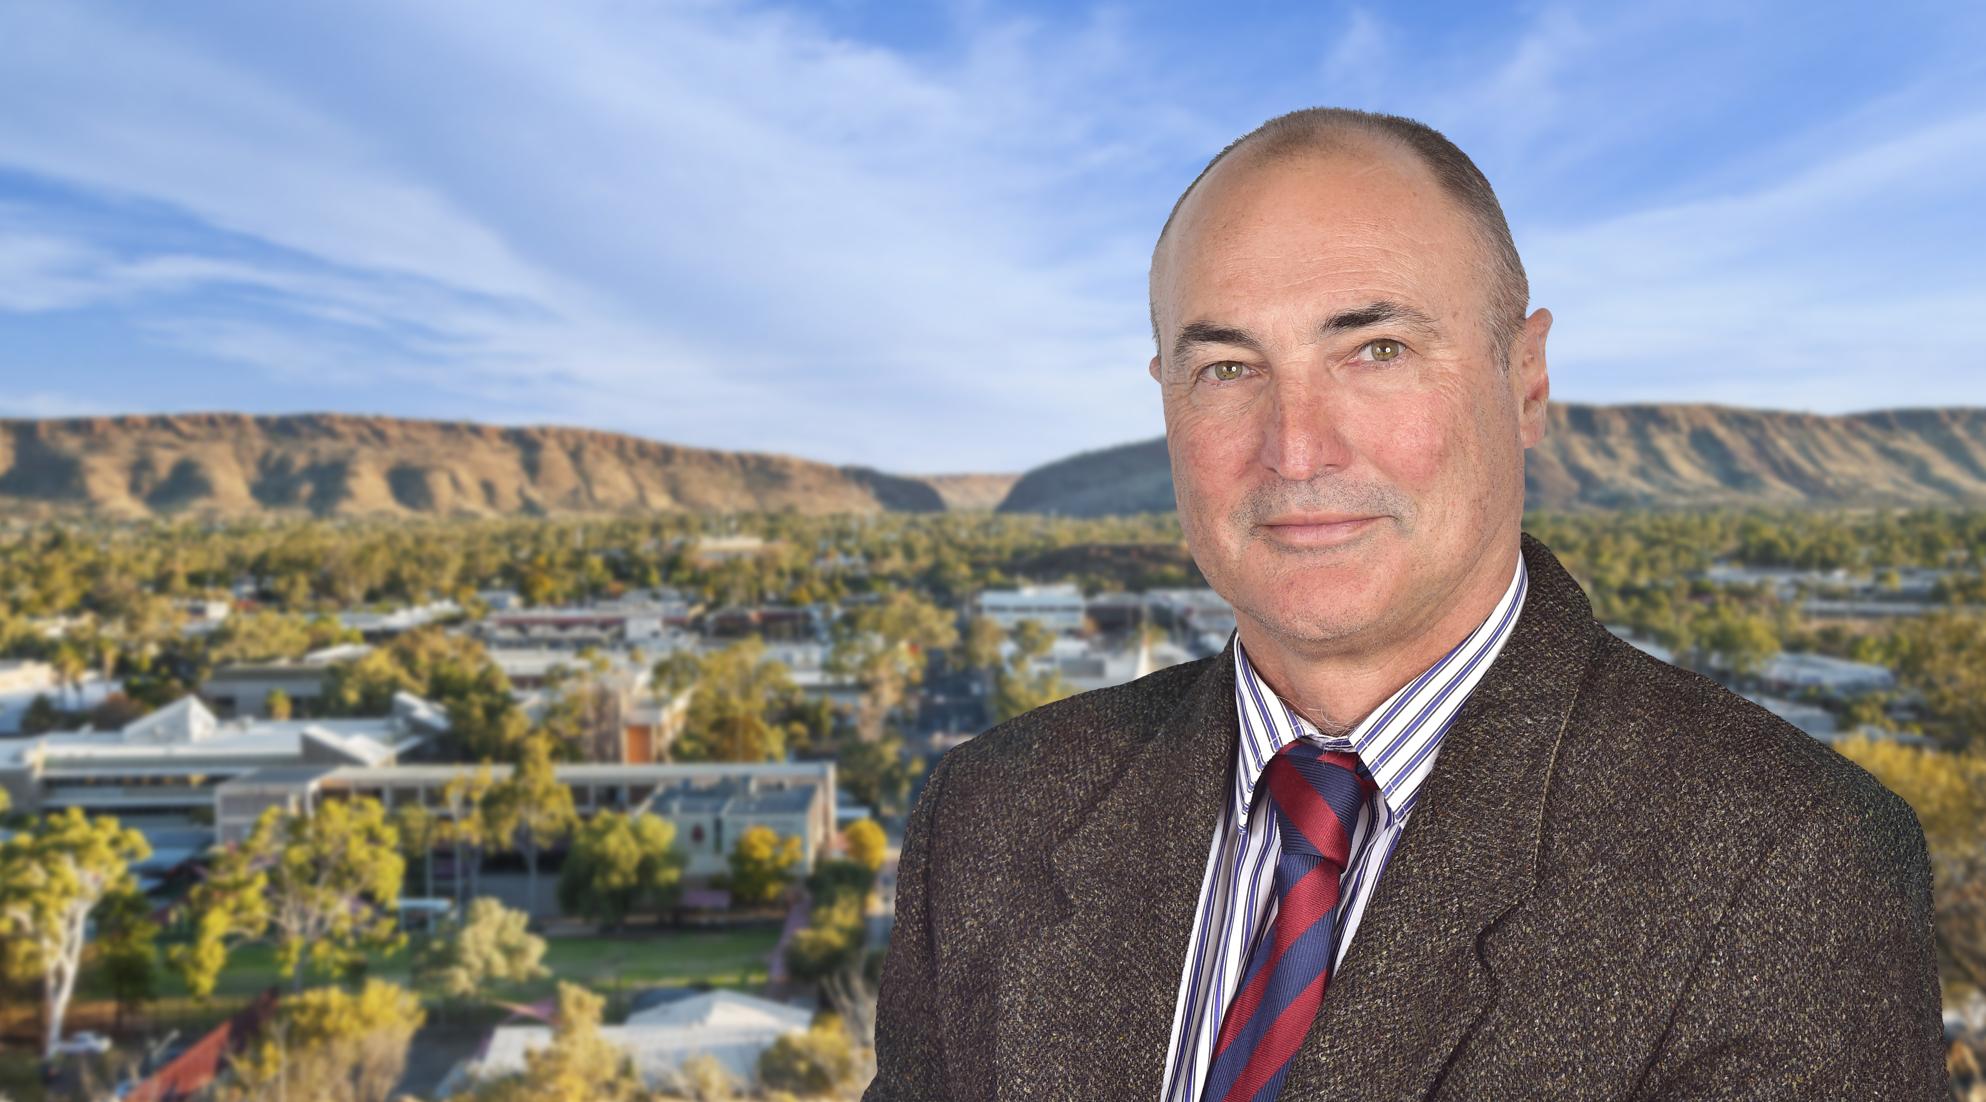 Ward Keller | Tony Whitelum | Personal Injury Lawyer | Alice Springs